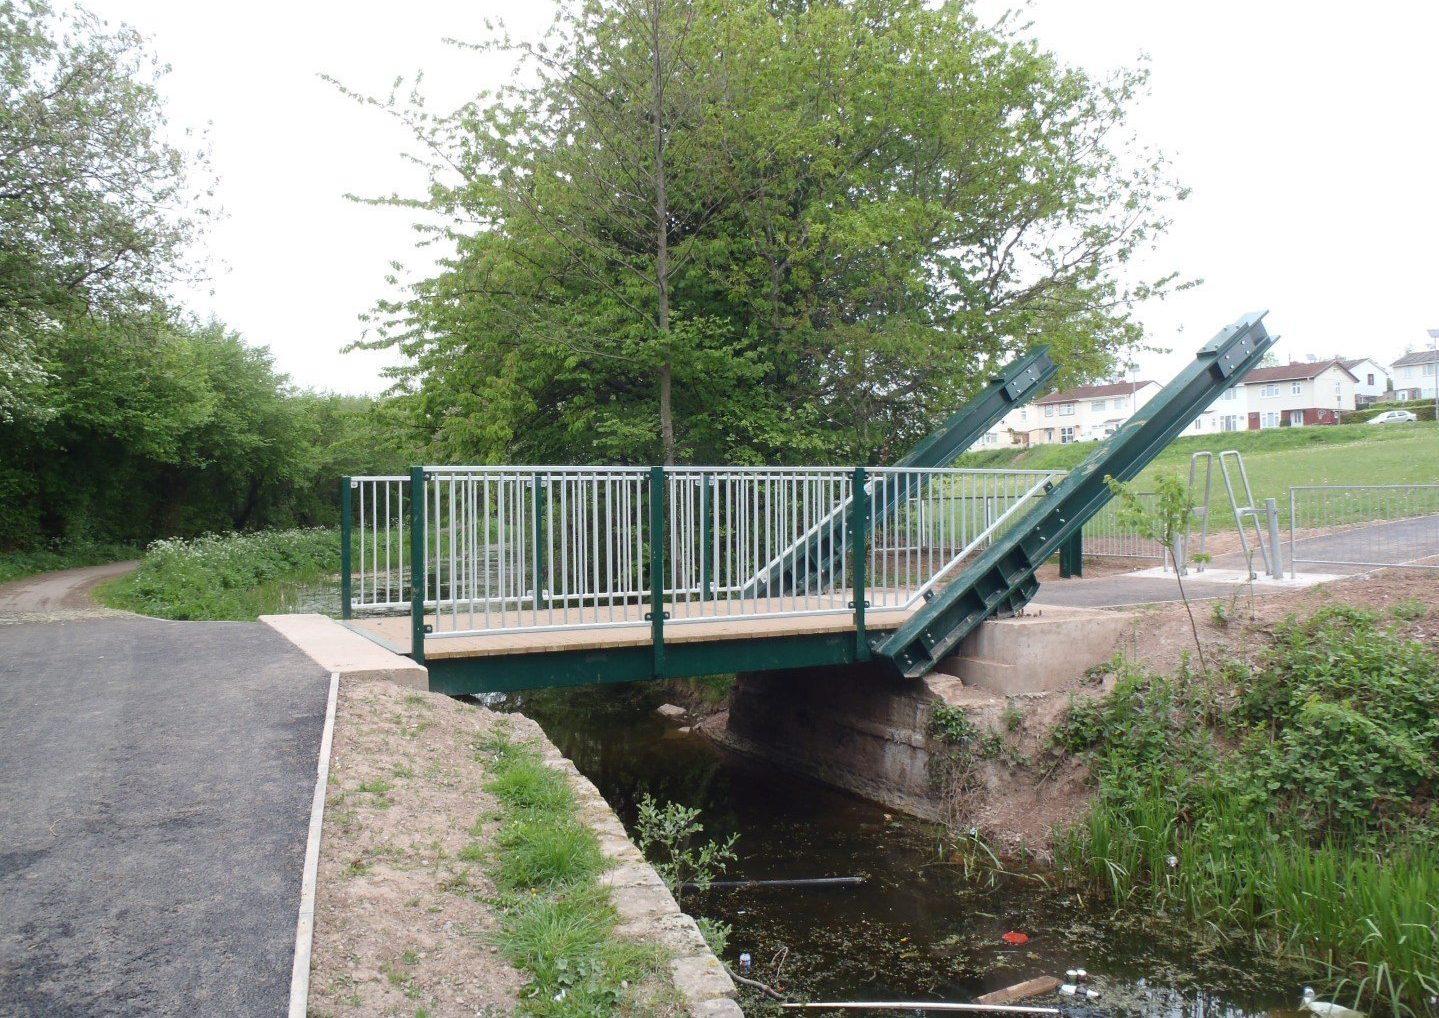 Manual rolling bascule bridge